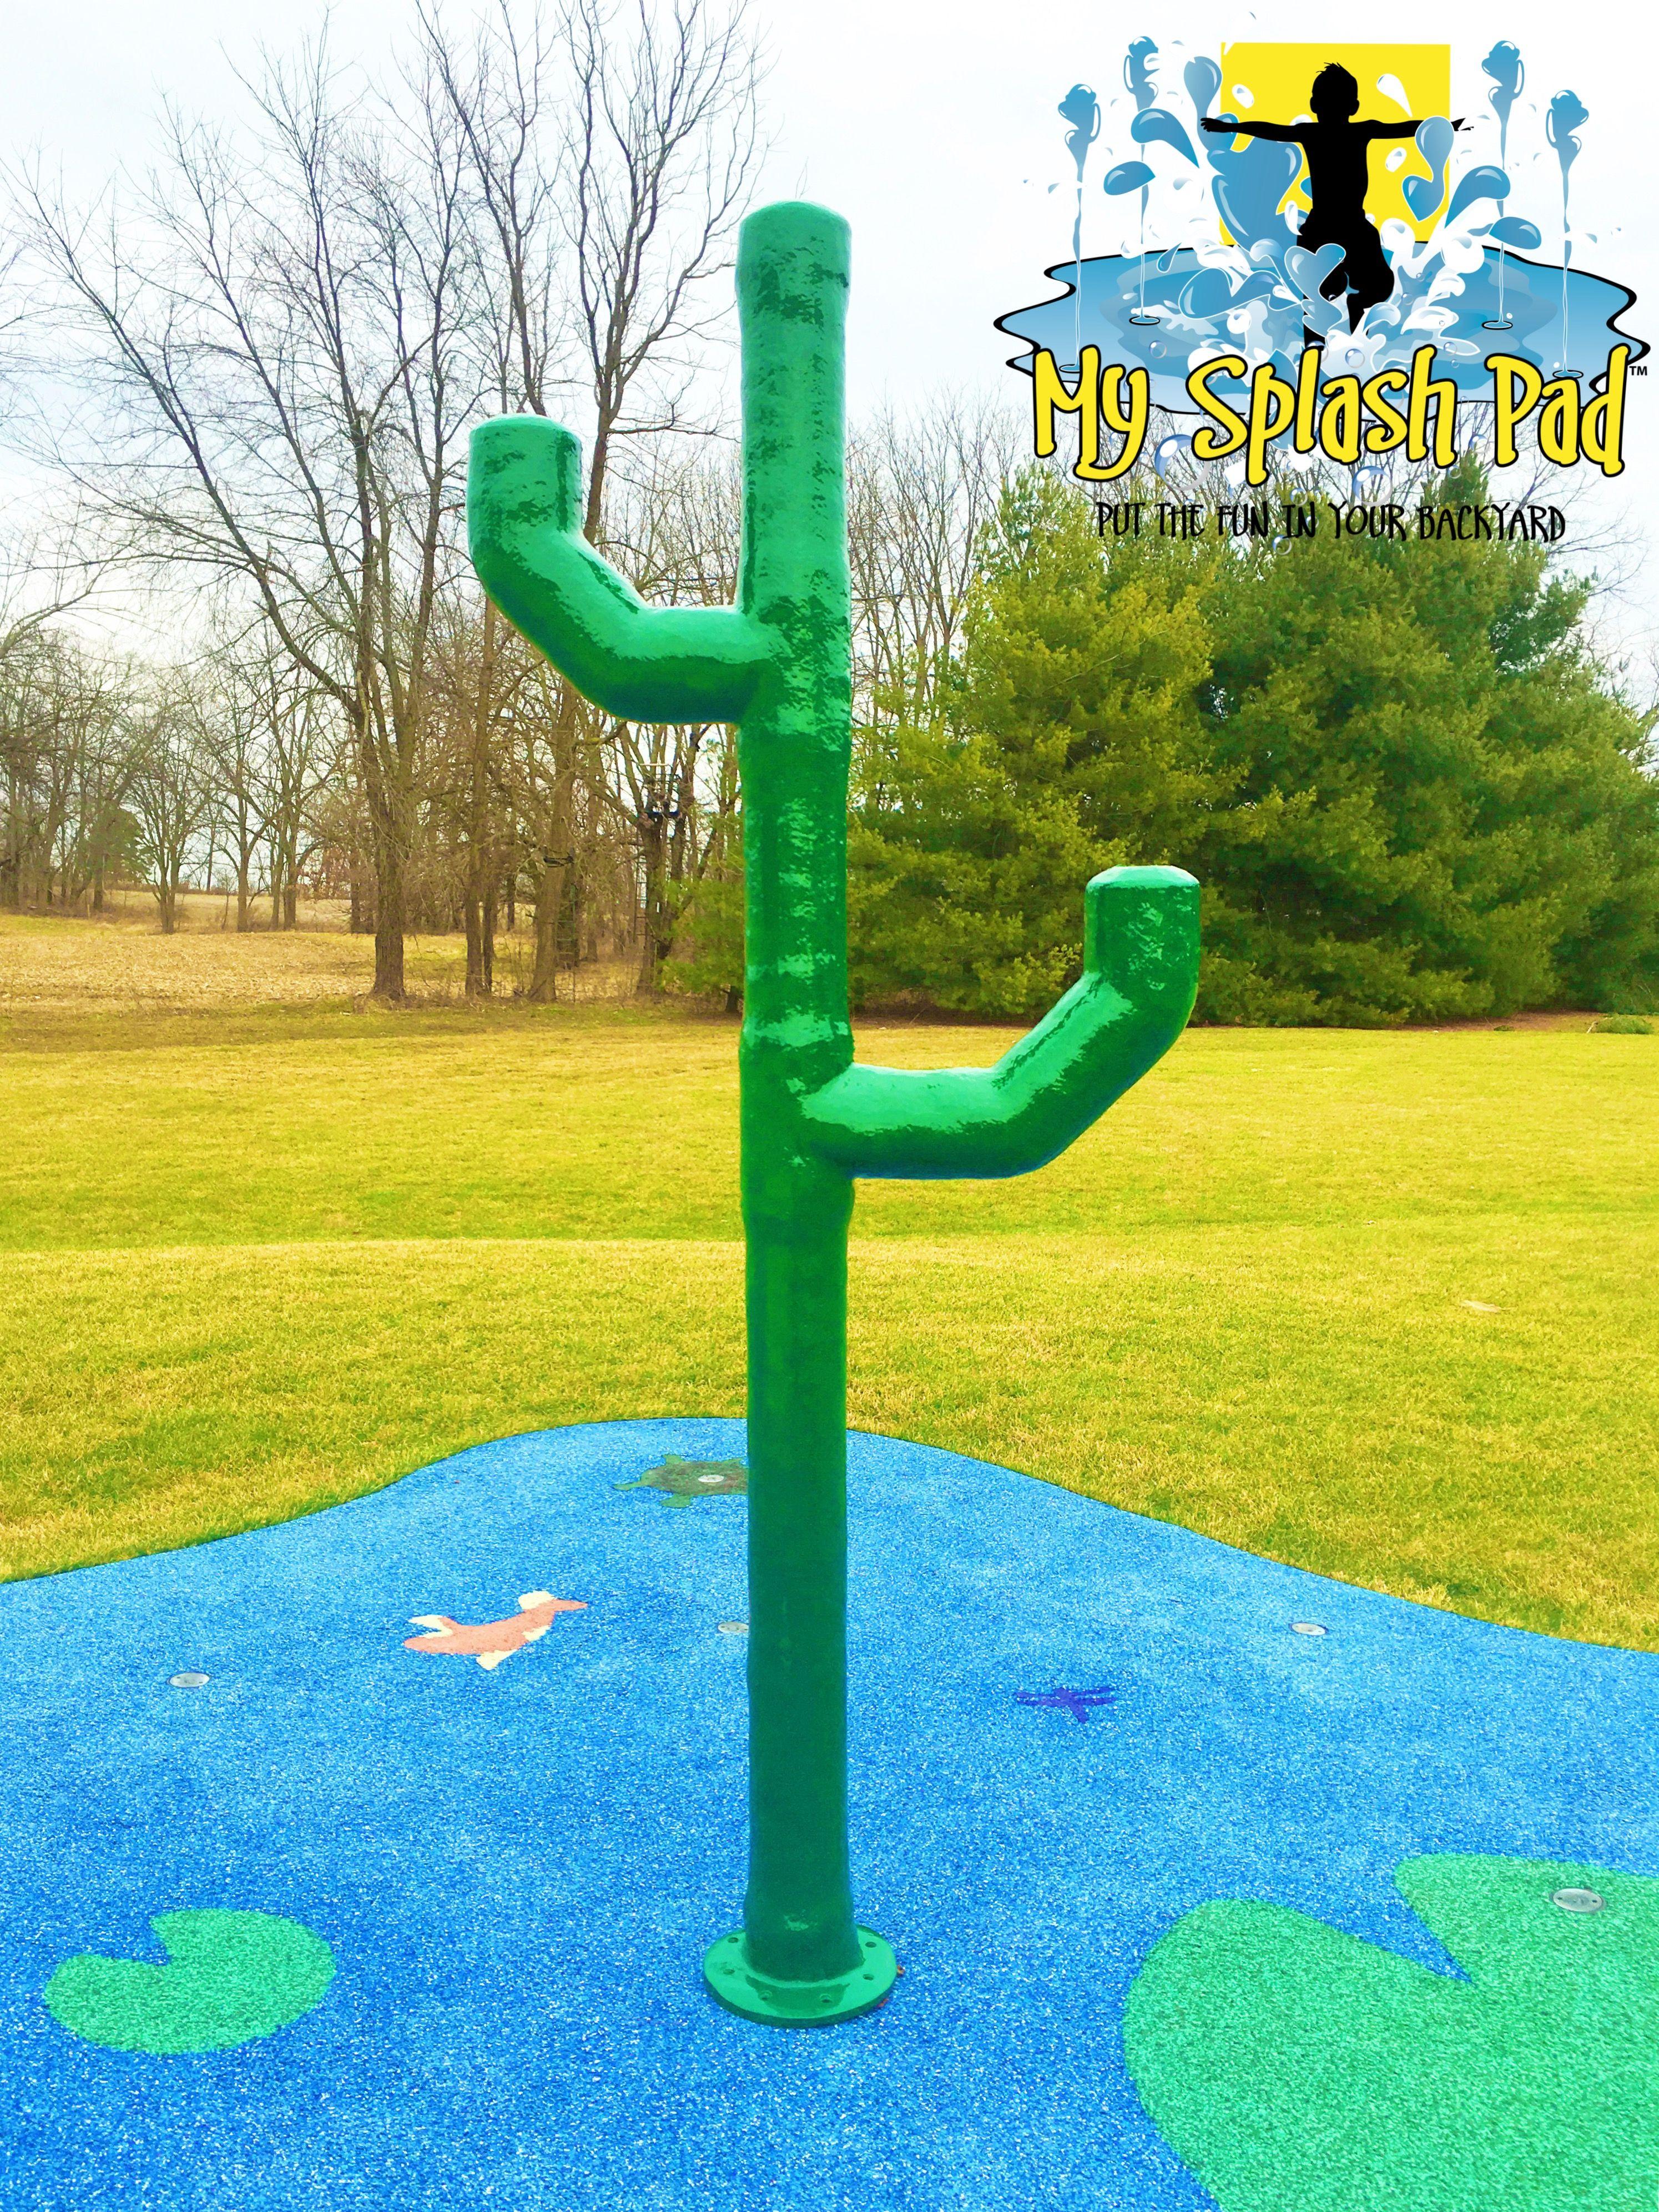 fun cactus for your backyard splash pad or community water park